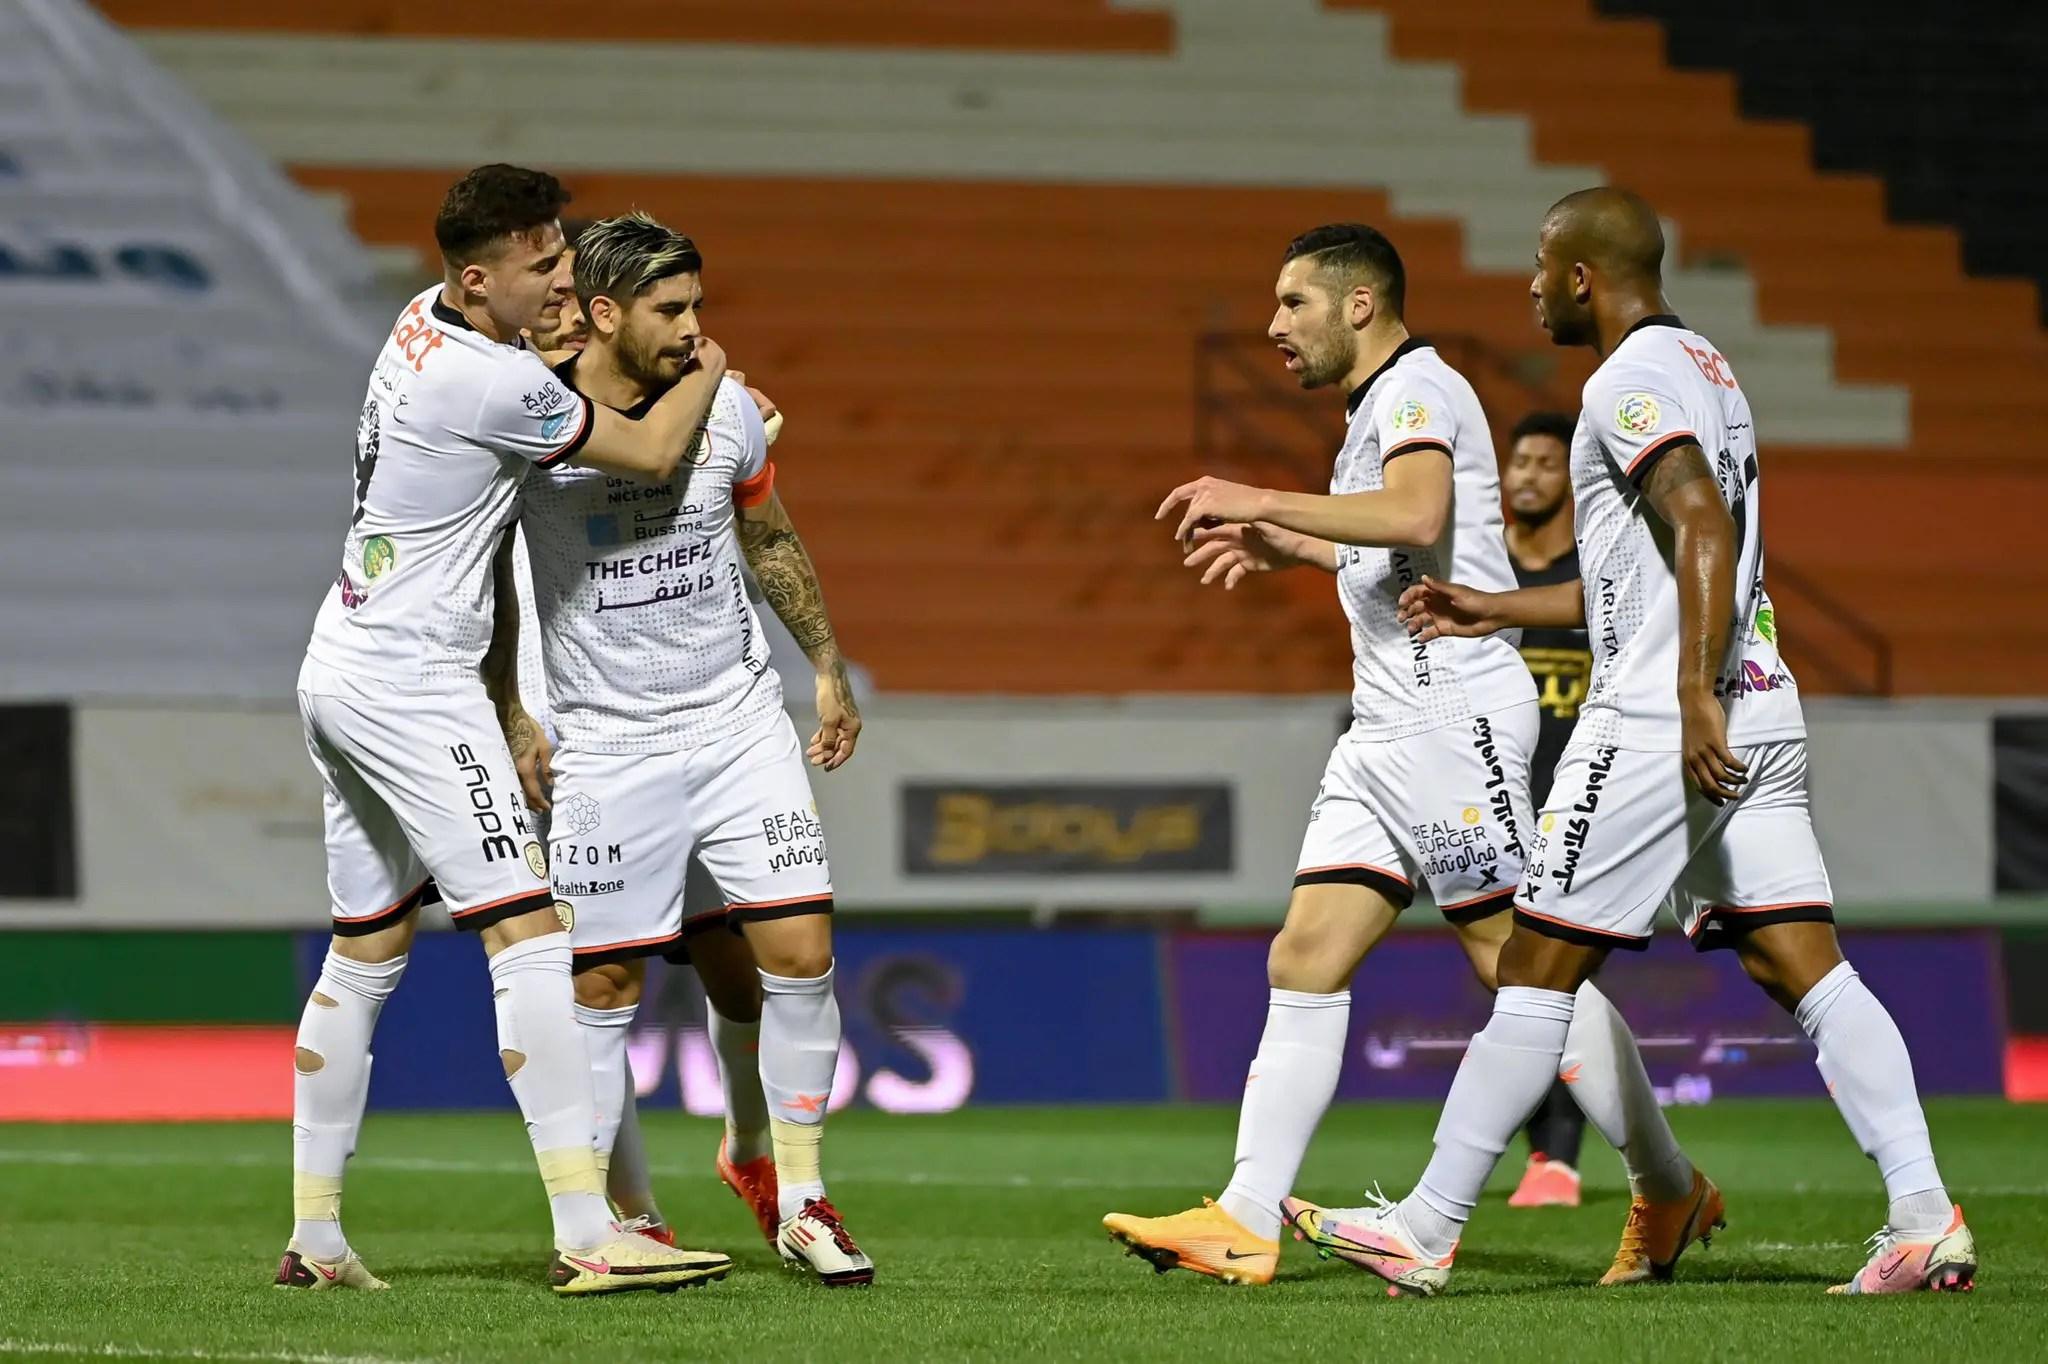 Saudi League: Ighalo Makes Winning Debut With Al Shabab